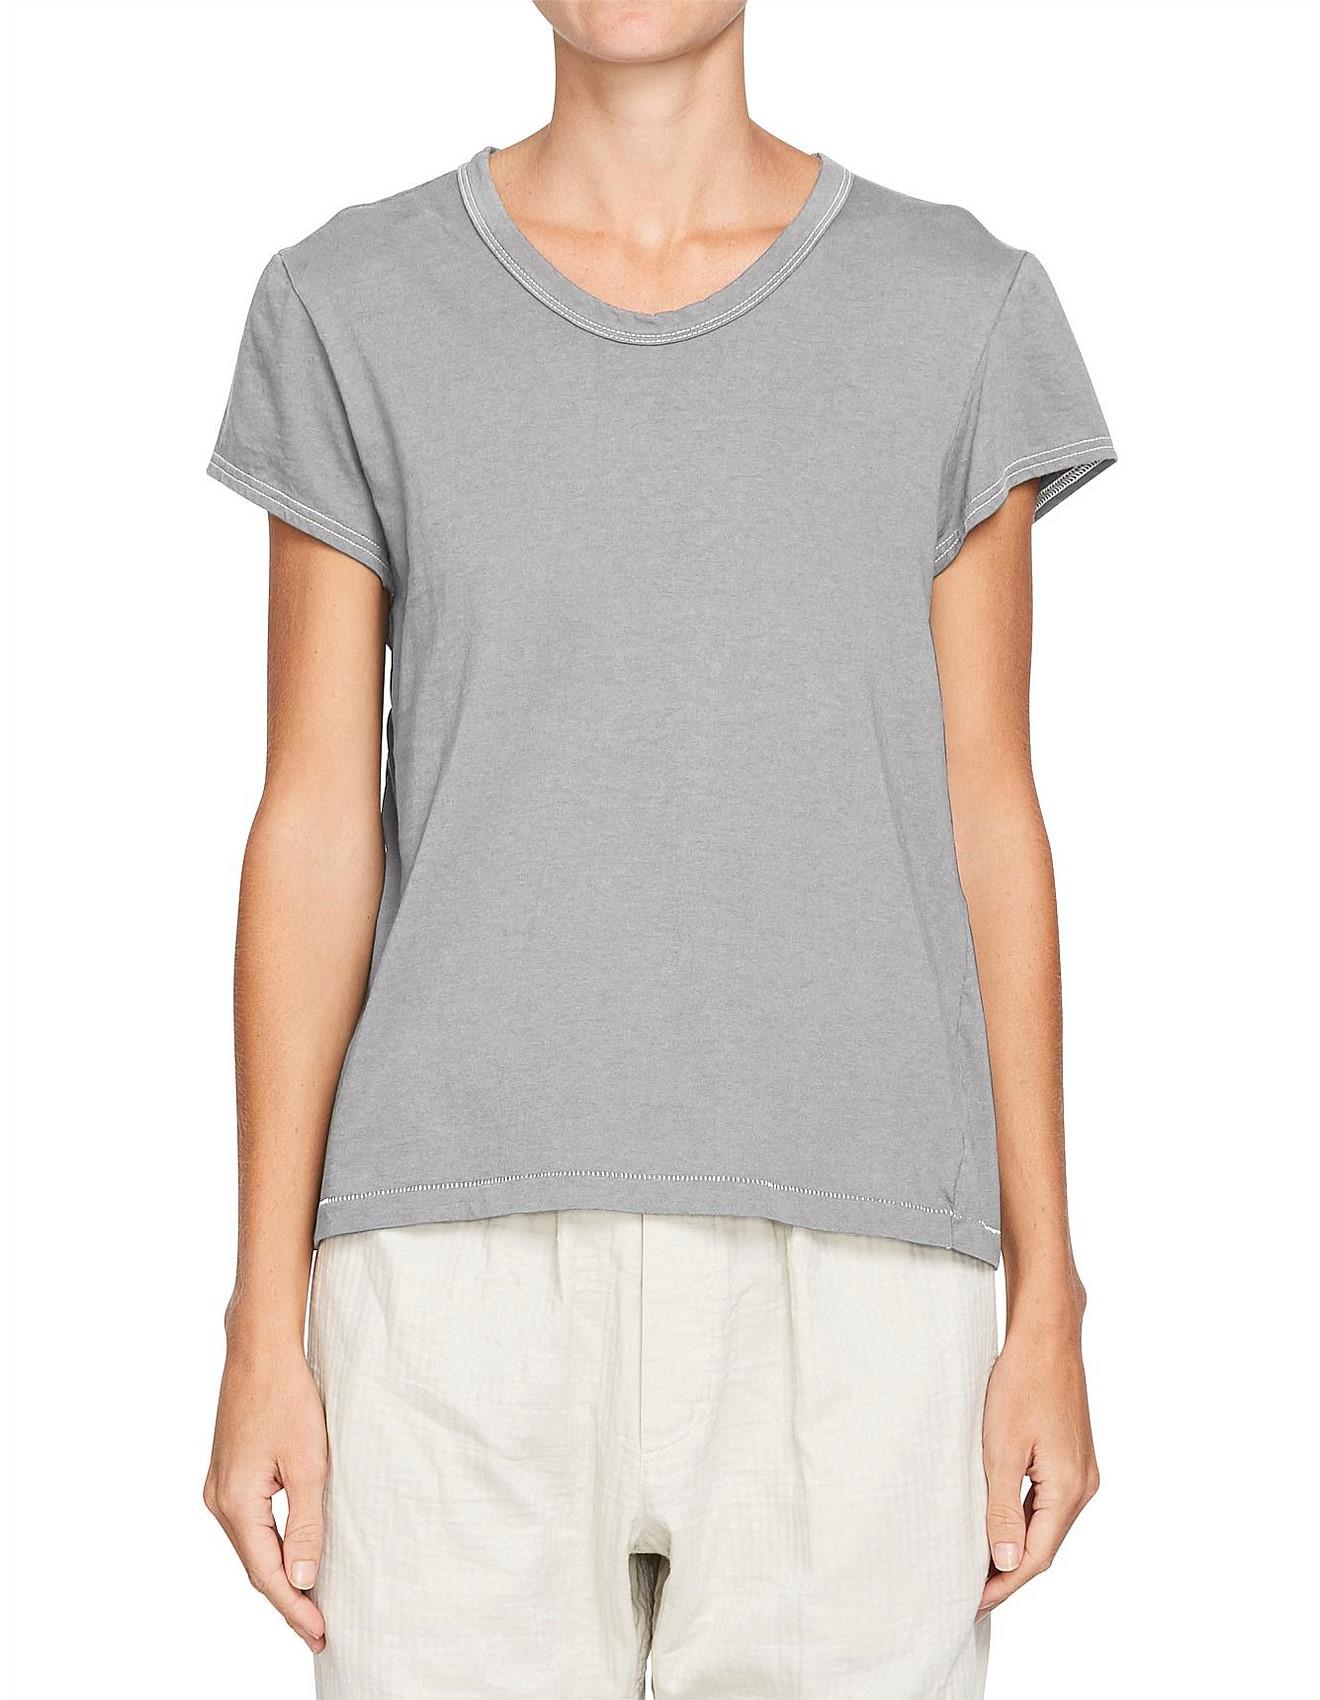 Women\'s T-Shirts | Designer Tops & T-Shirts Online | David Jones ...